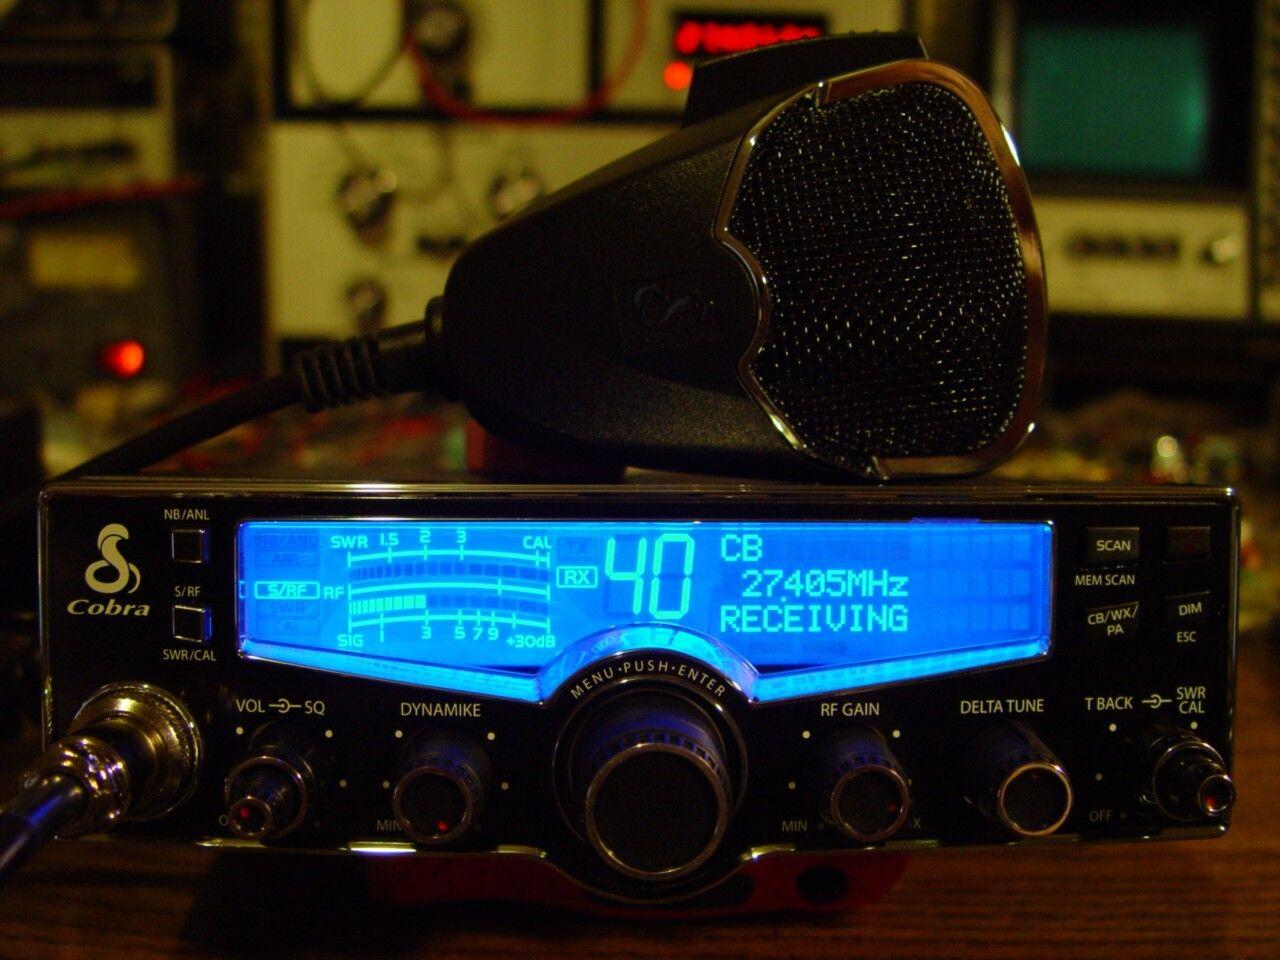 UPGRADED MOSFET FINAL COBRA 29 LXBT LX BT BLUETOOTH WIRELESS CB RADIO PRO TUNED